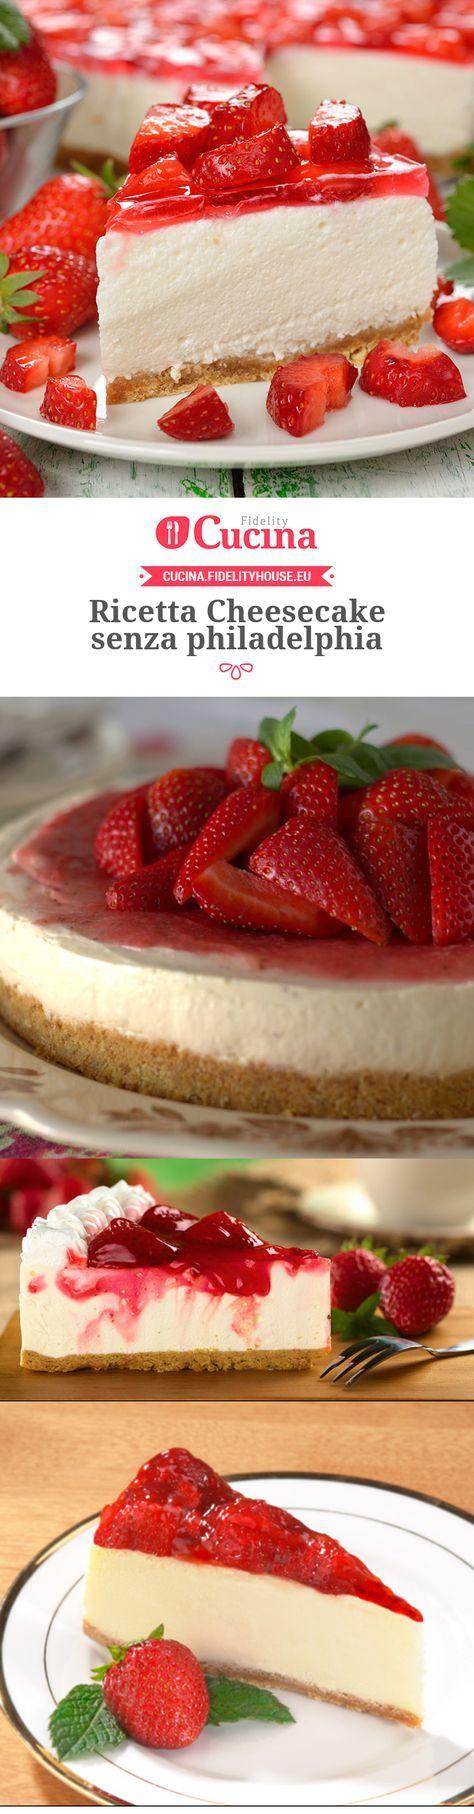 Ricetta Cheesecake senza philadelphia